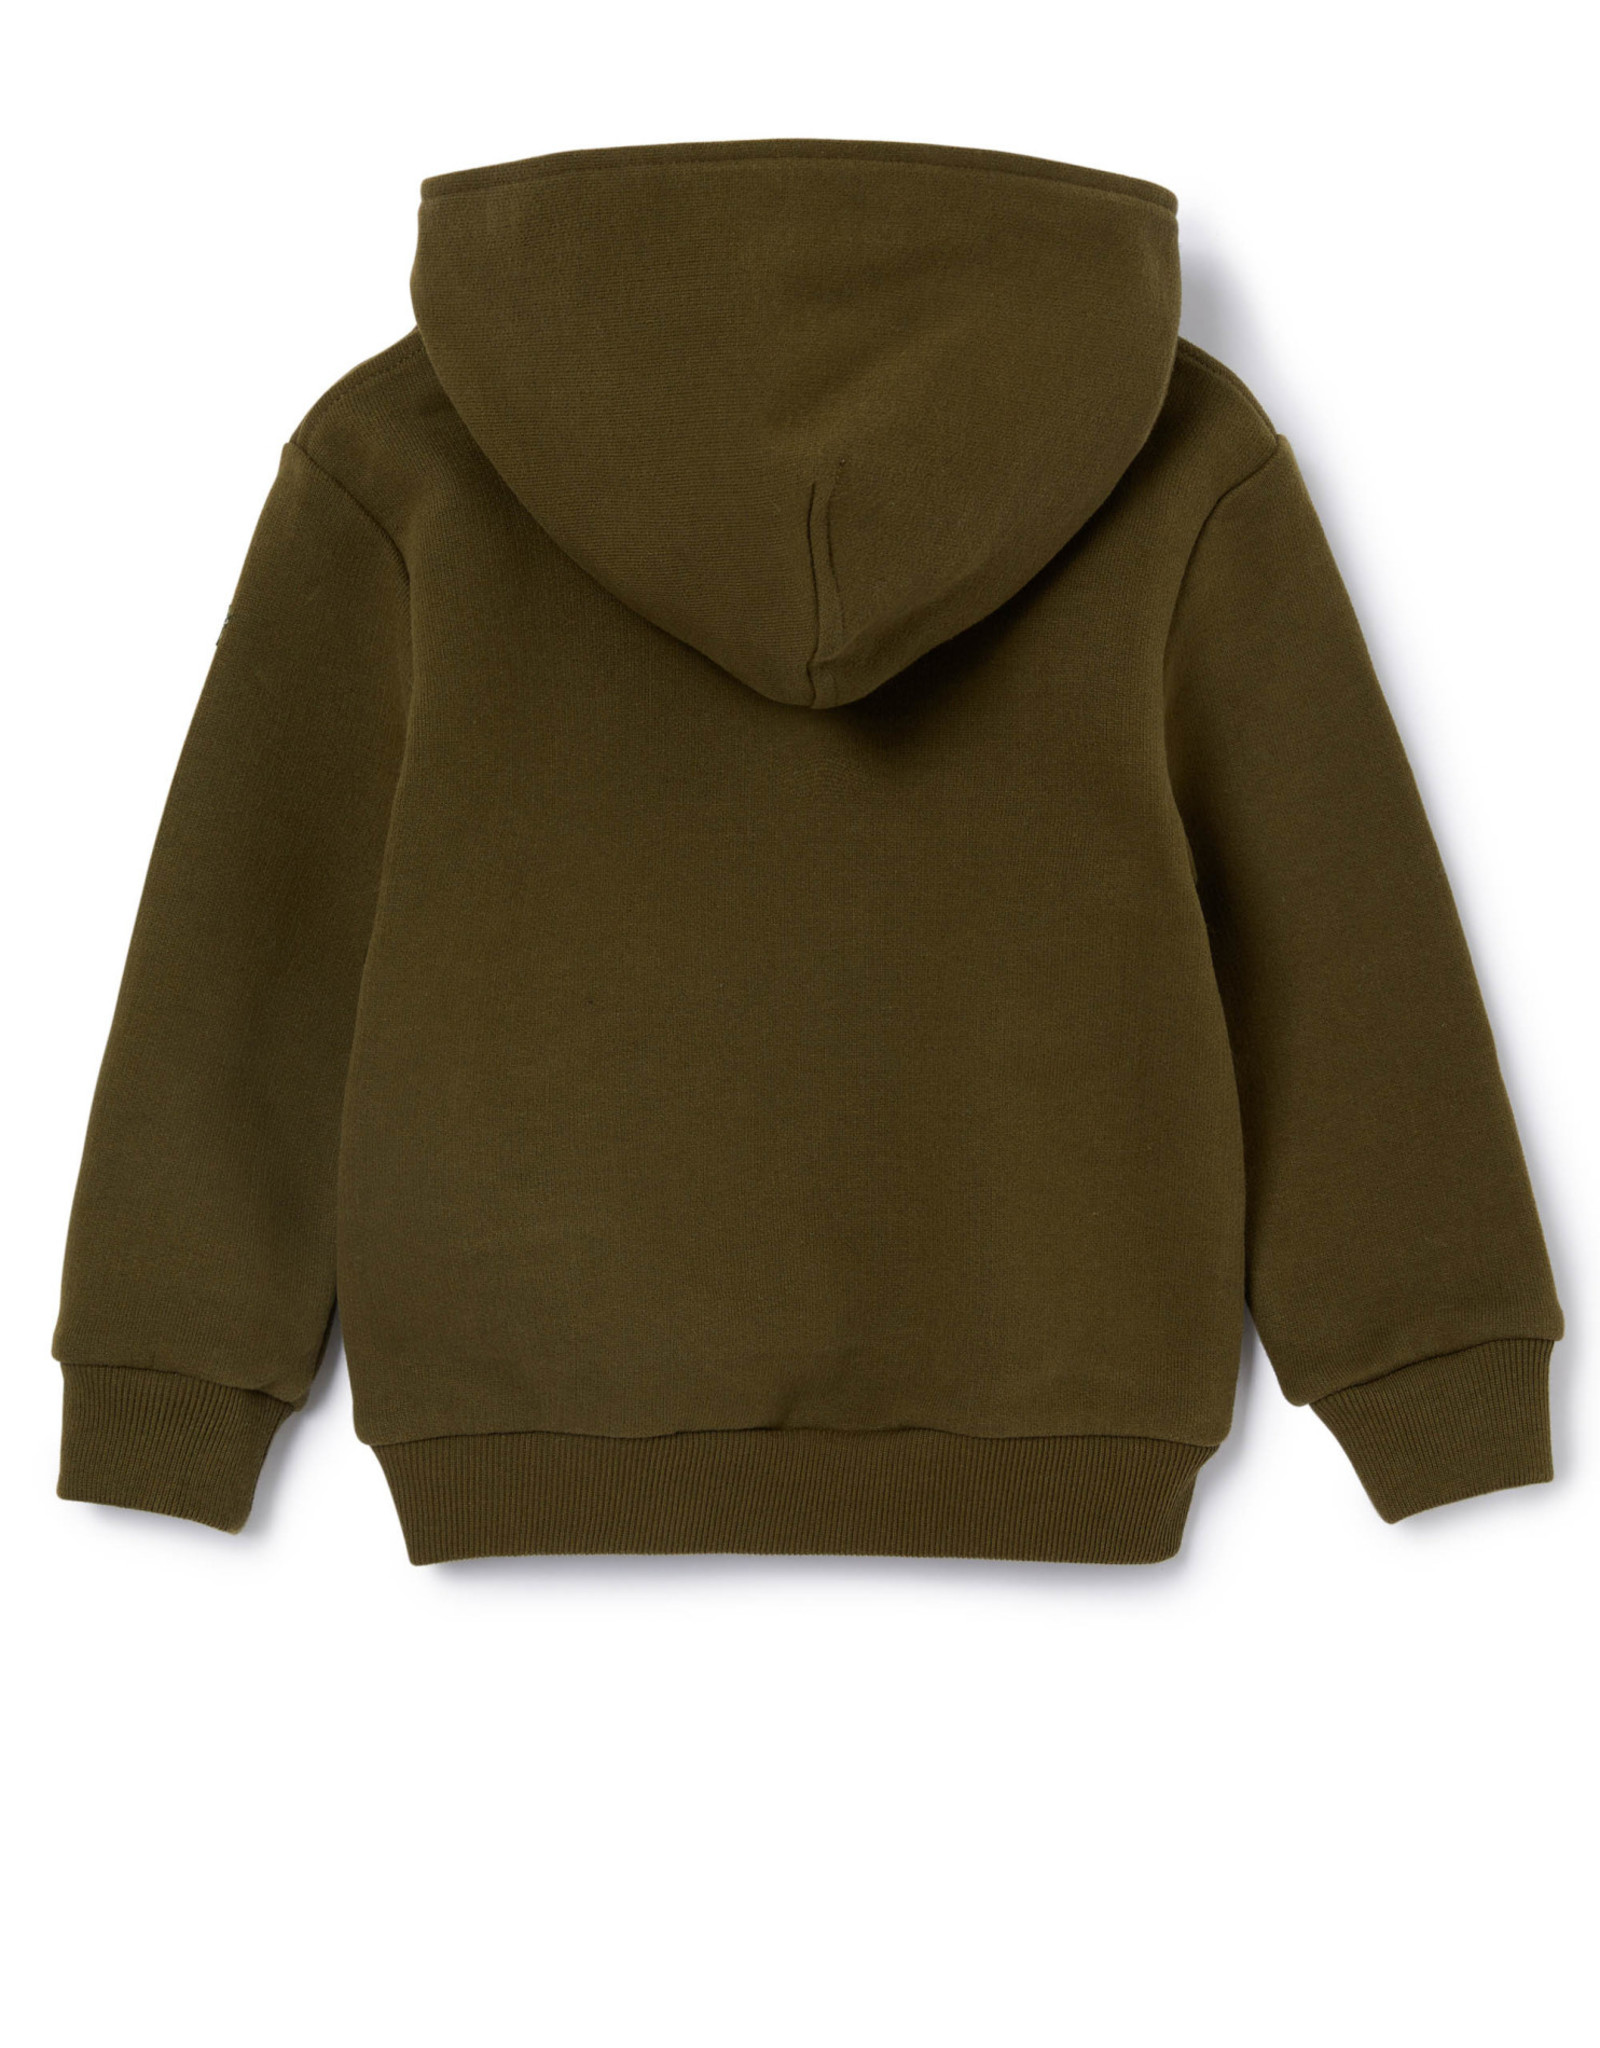 IL GUFO Cotton Sweater Hunter Green/Bran Beige